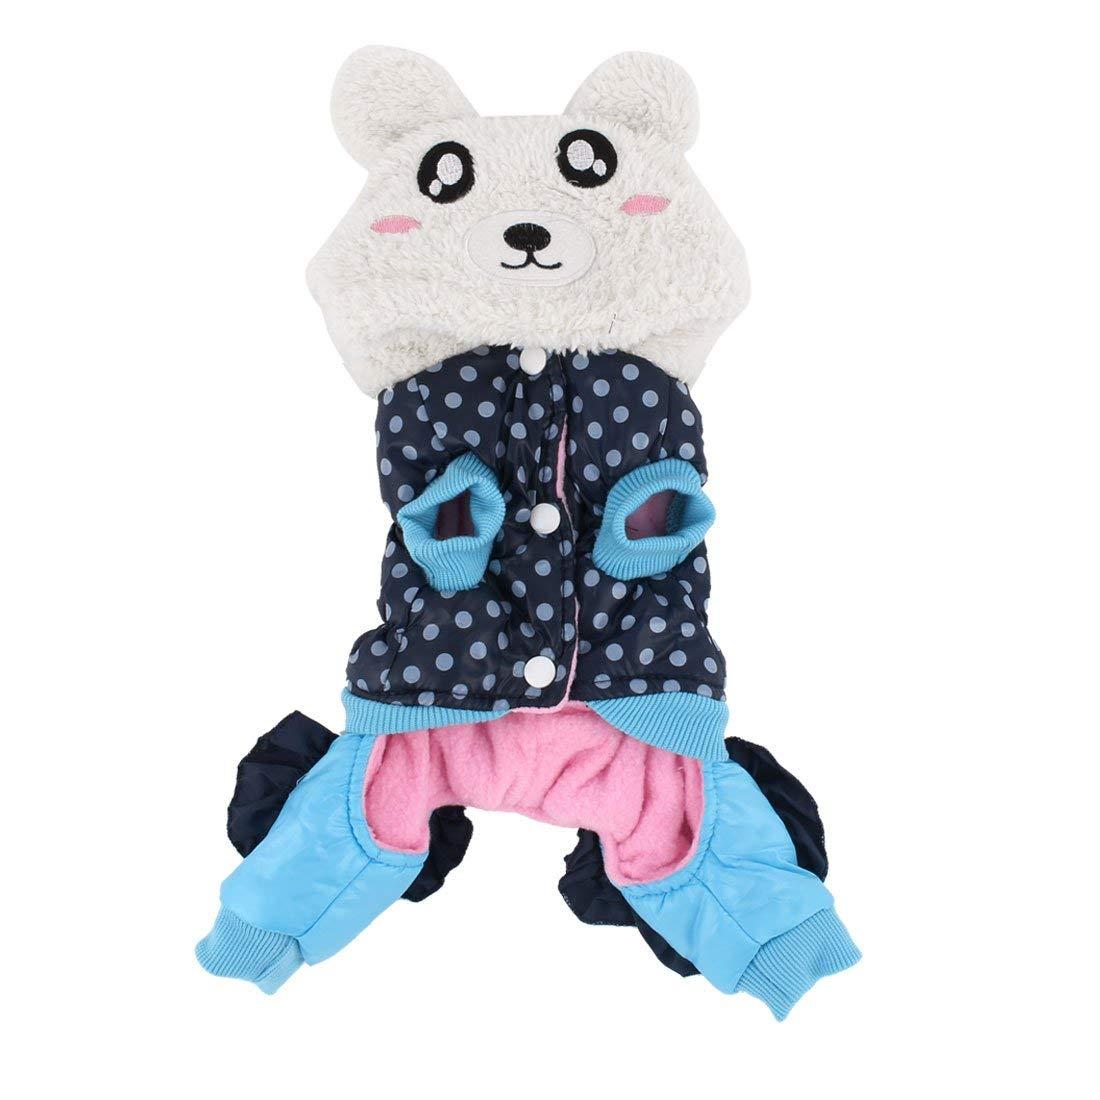 Cotton Blends Panda Shaped Pet Dog Doggy Clothes Coat Dark bluee White